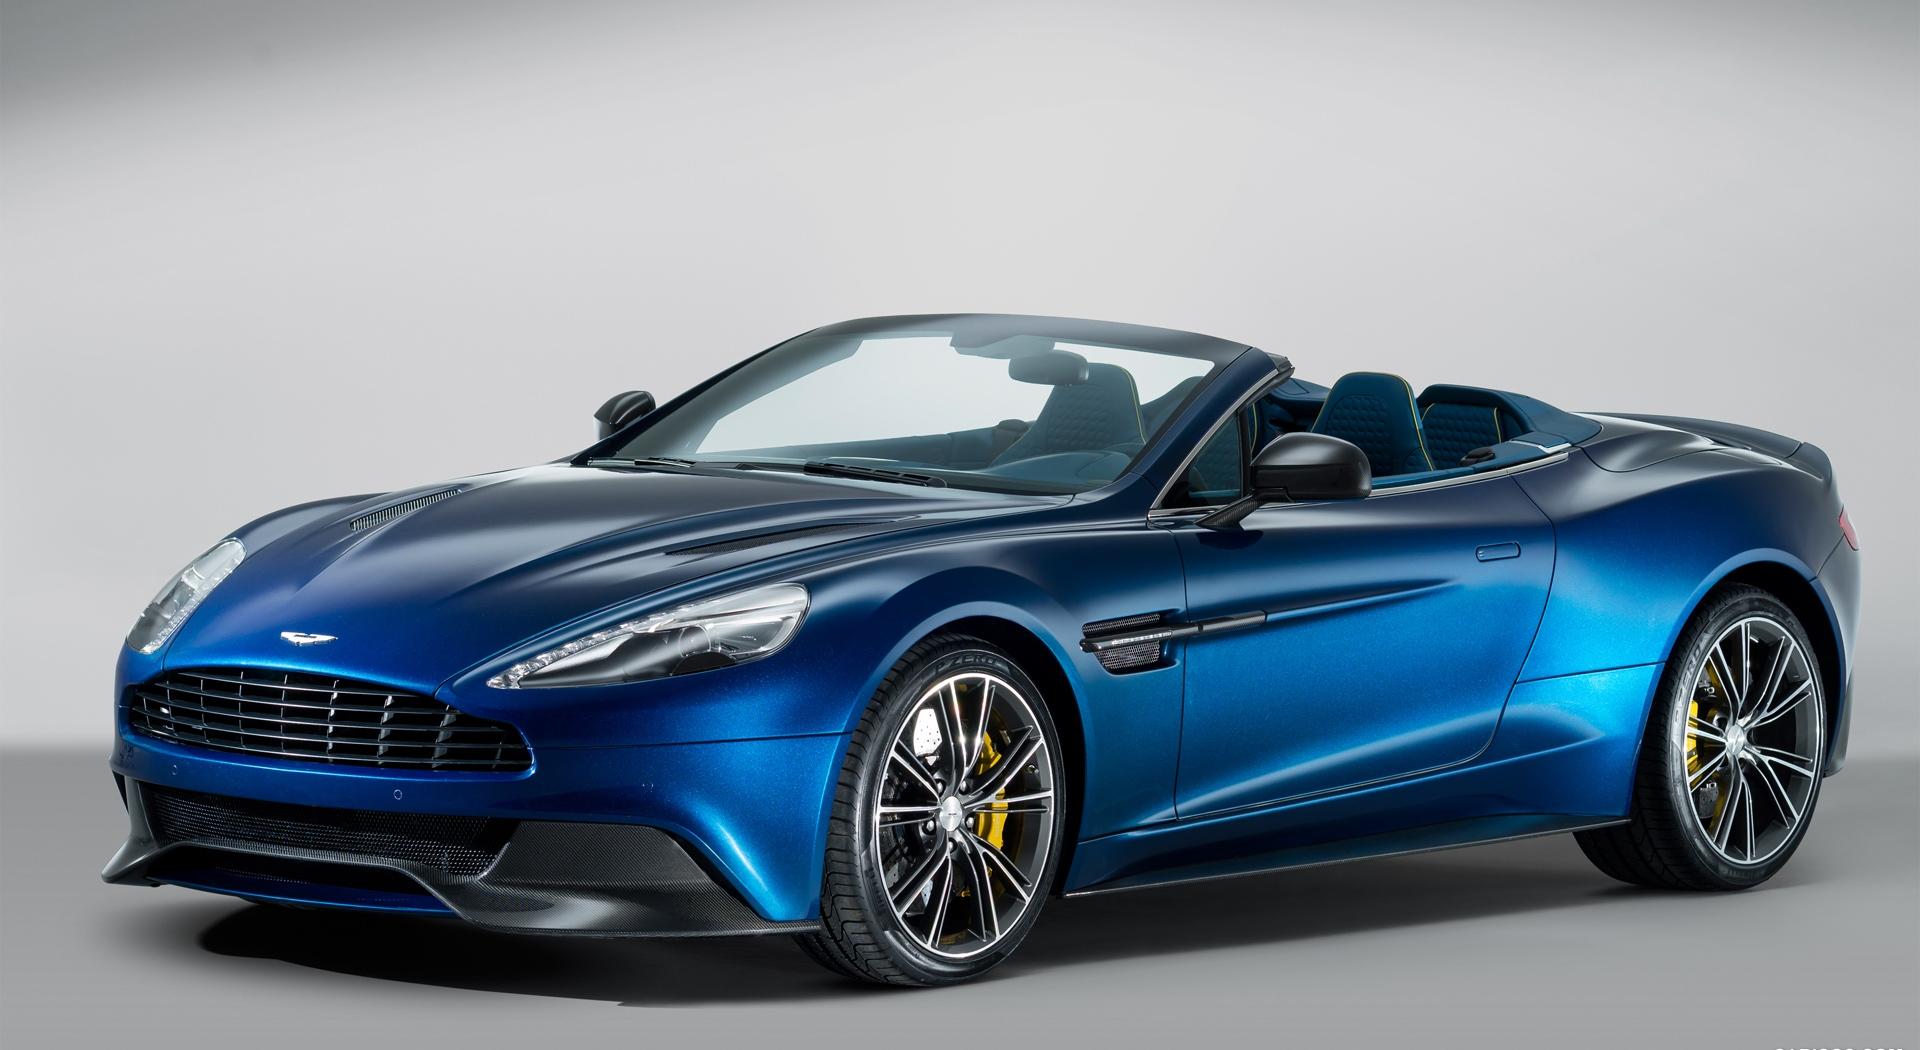 Aston Martin Vanquish Wallpapers HD A1